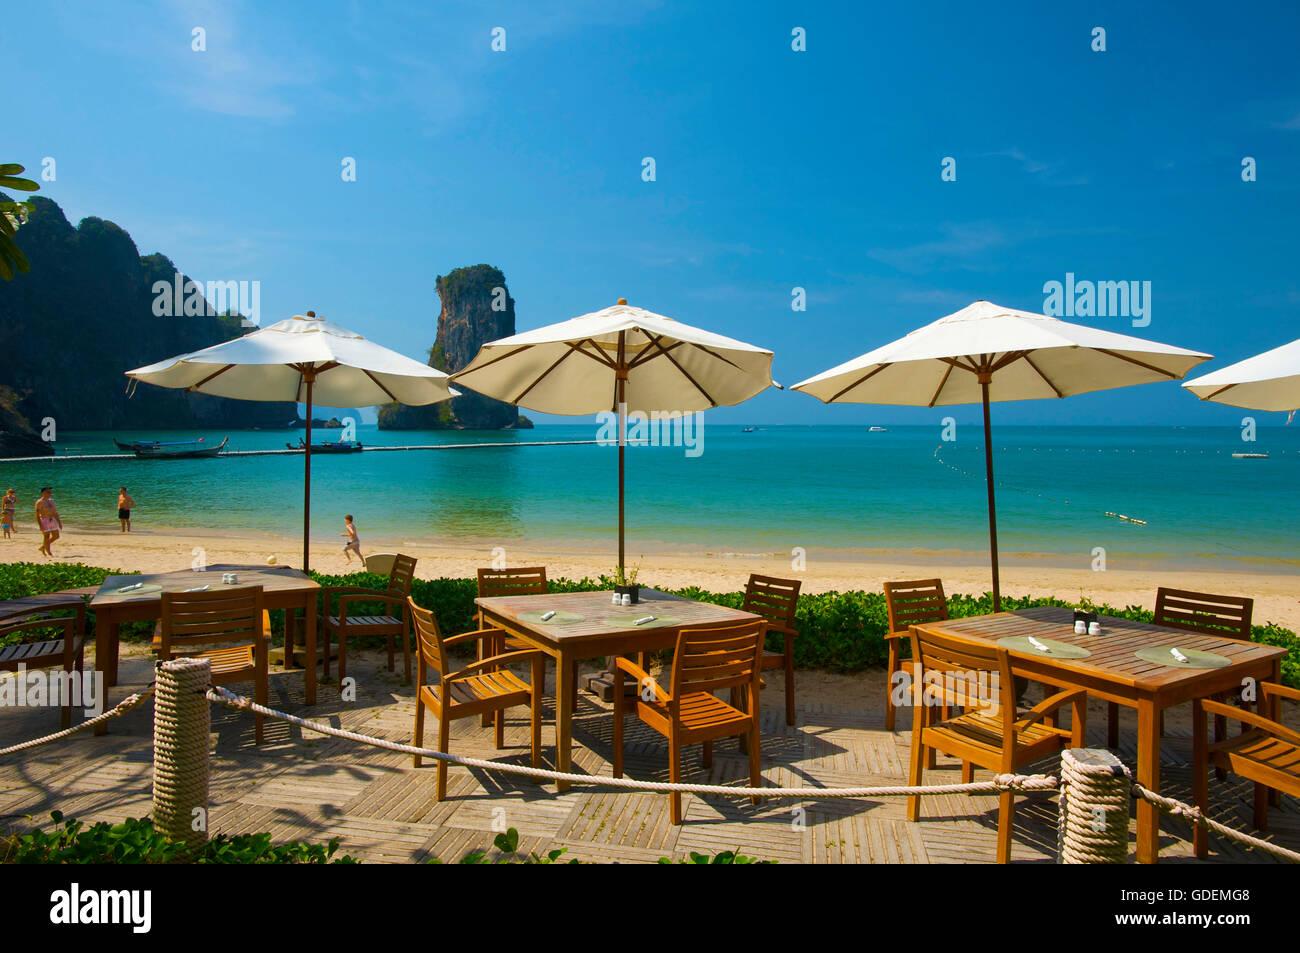 Centara Resort, Krabi, Thailand - Stock Image